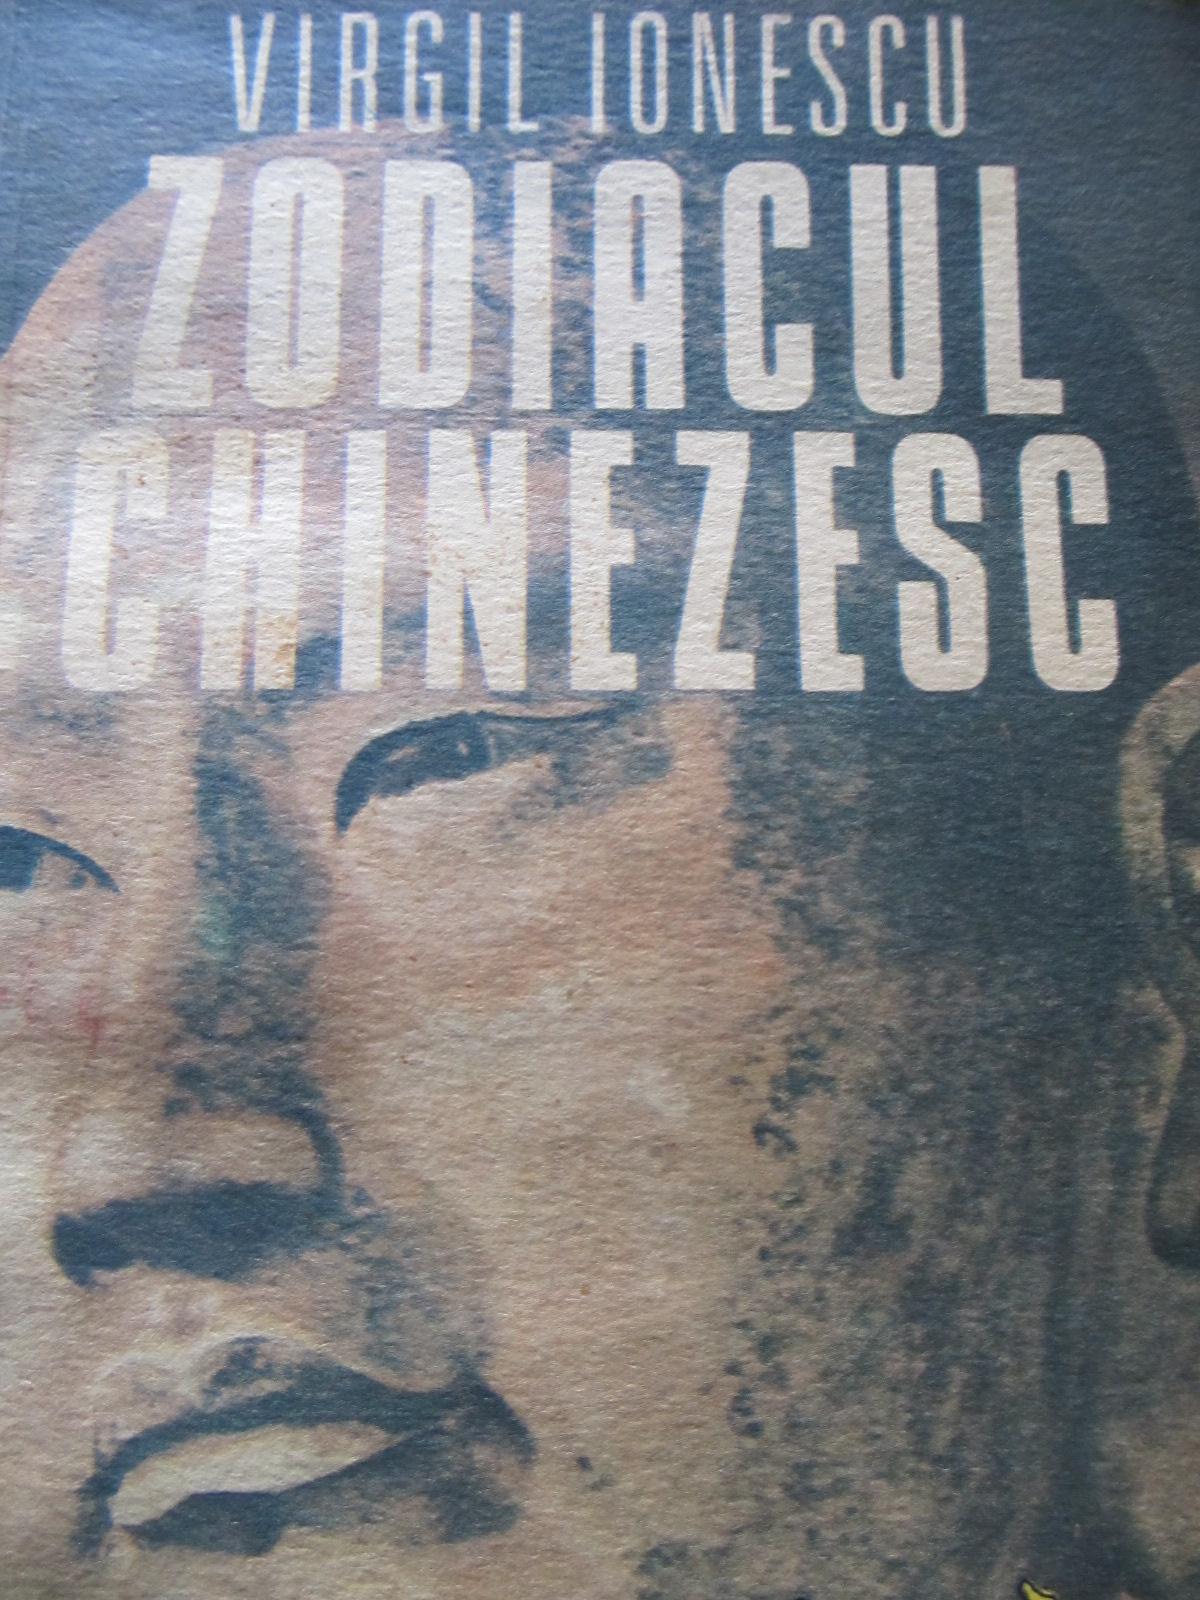 Zodiacul chinezesc - O abordare stiintifica - Virgil Ionescu | Detalii carte